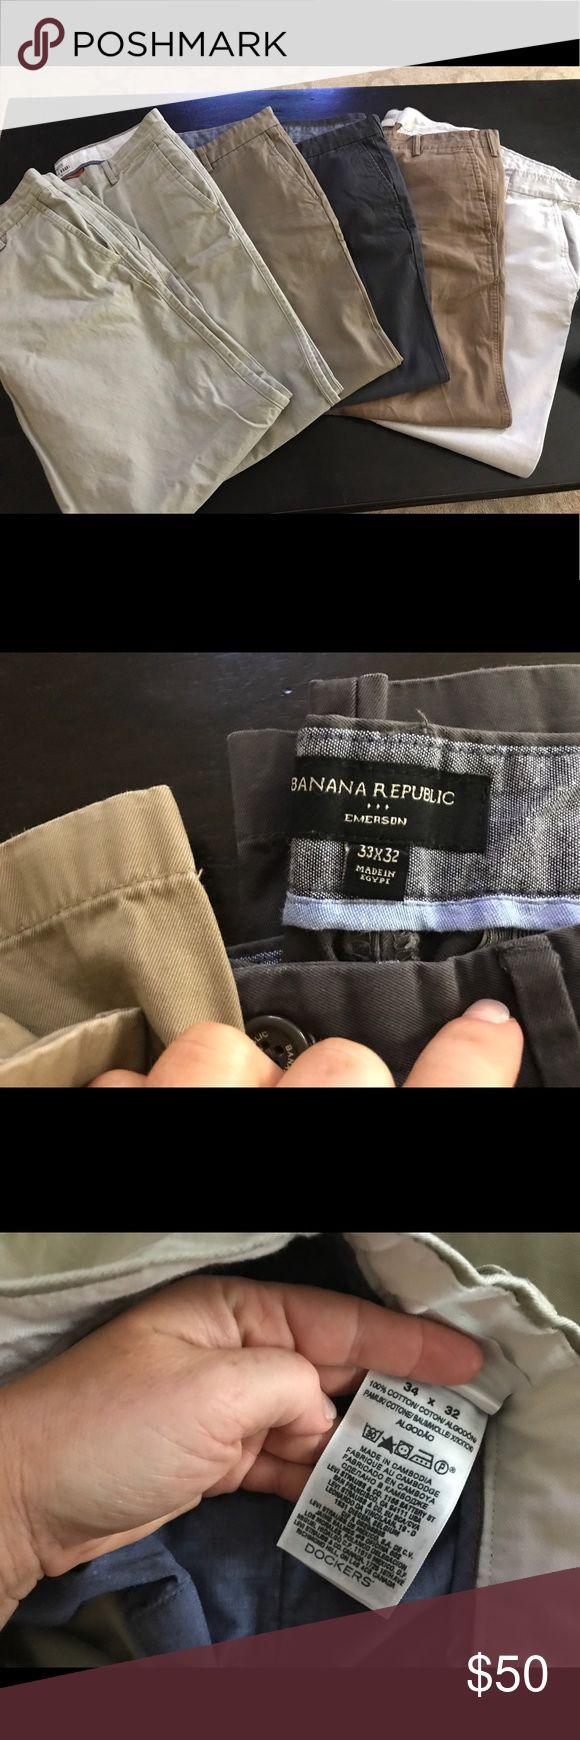 Lot of 6 - Men's Khaki pants EUC / 34x32 and 33x32 men's khaki pants lot of 6.  Qty 2 dockers Qty 2 banana republic and Qty 2 gap. Gap and Dockers are 34x32 and Banana Republic are 33x32 Banana Republic Pants Chinos & Khakis